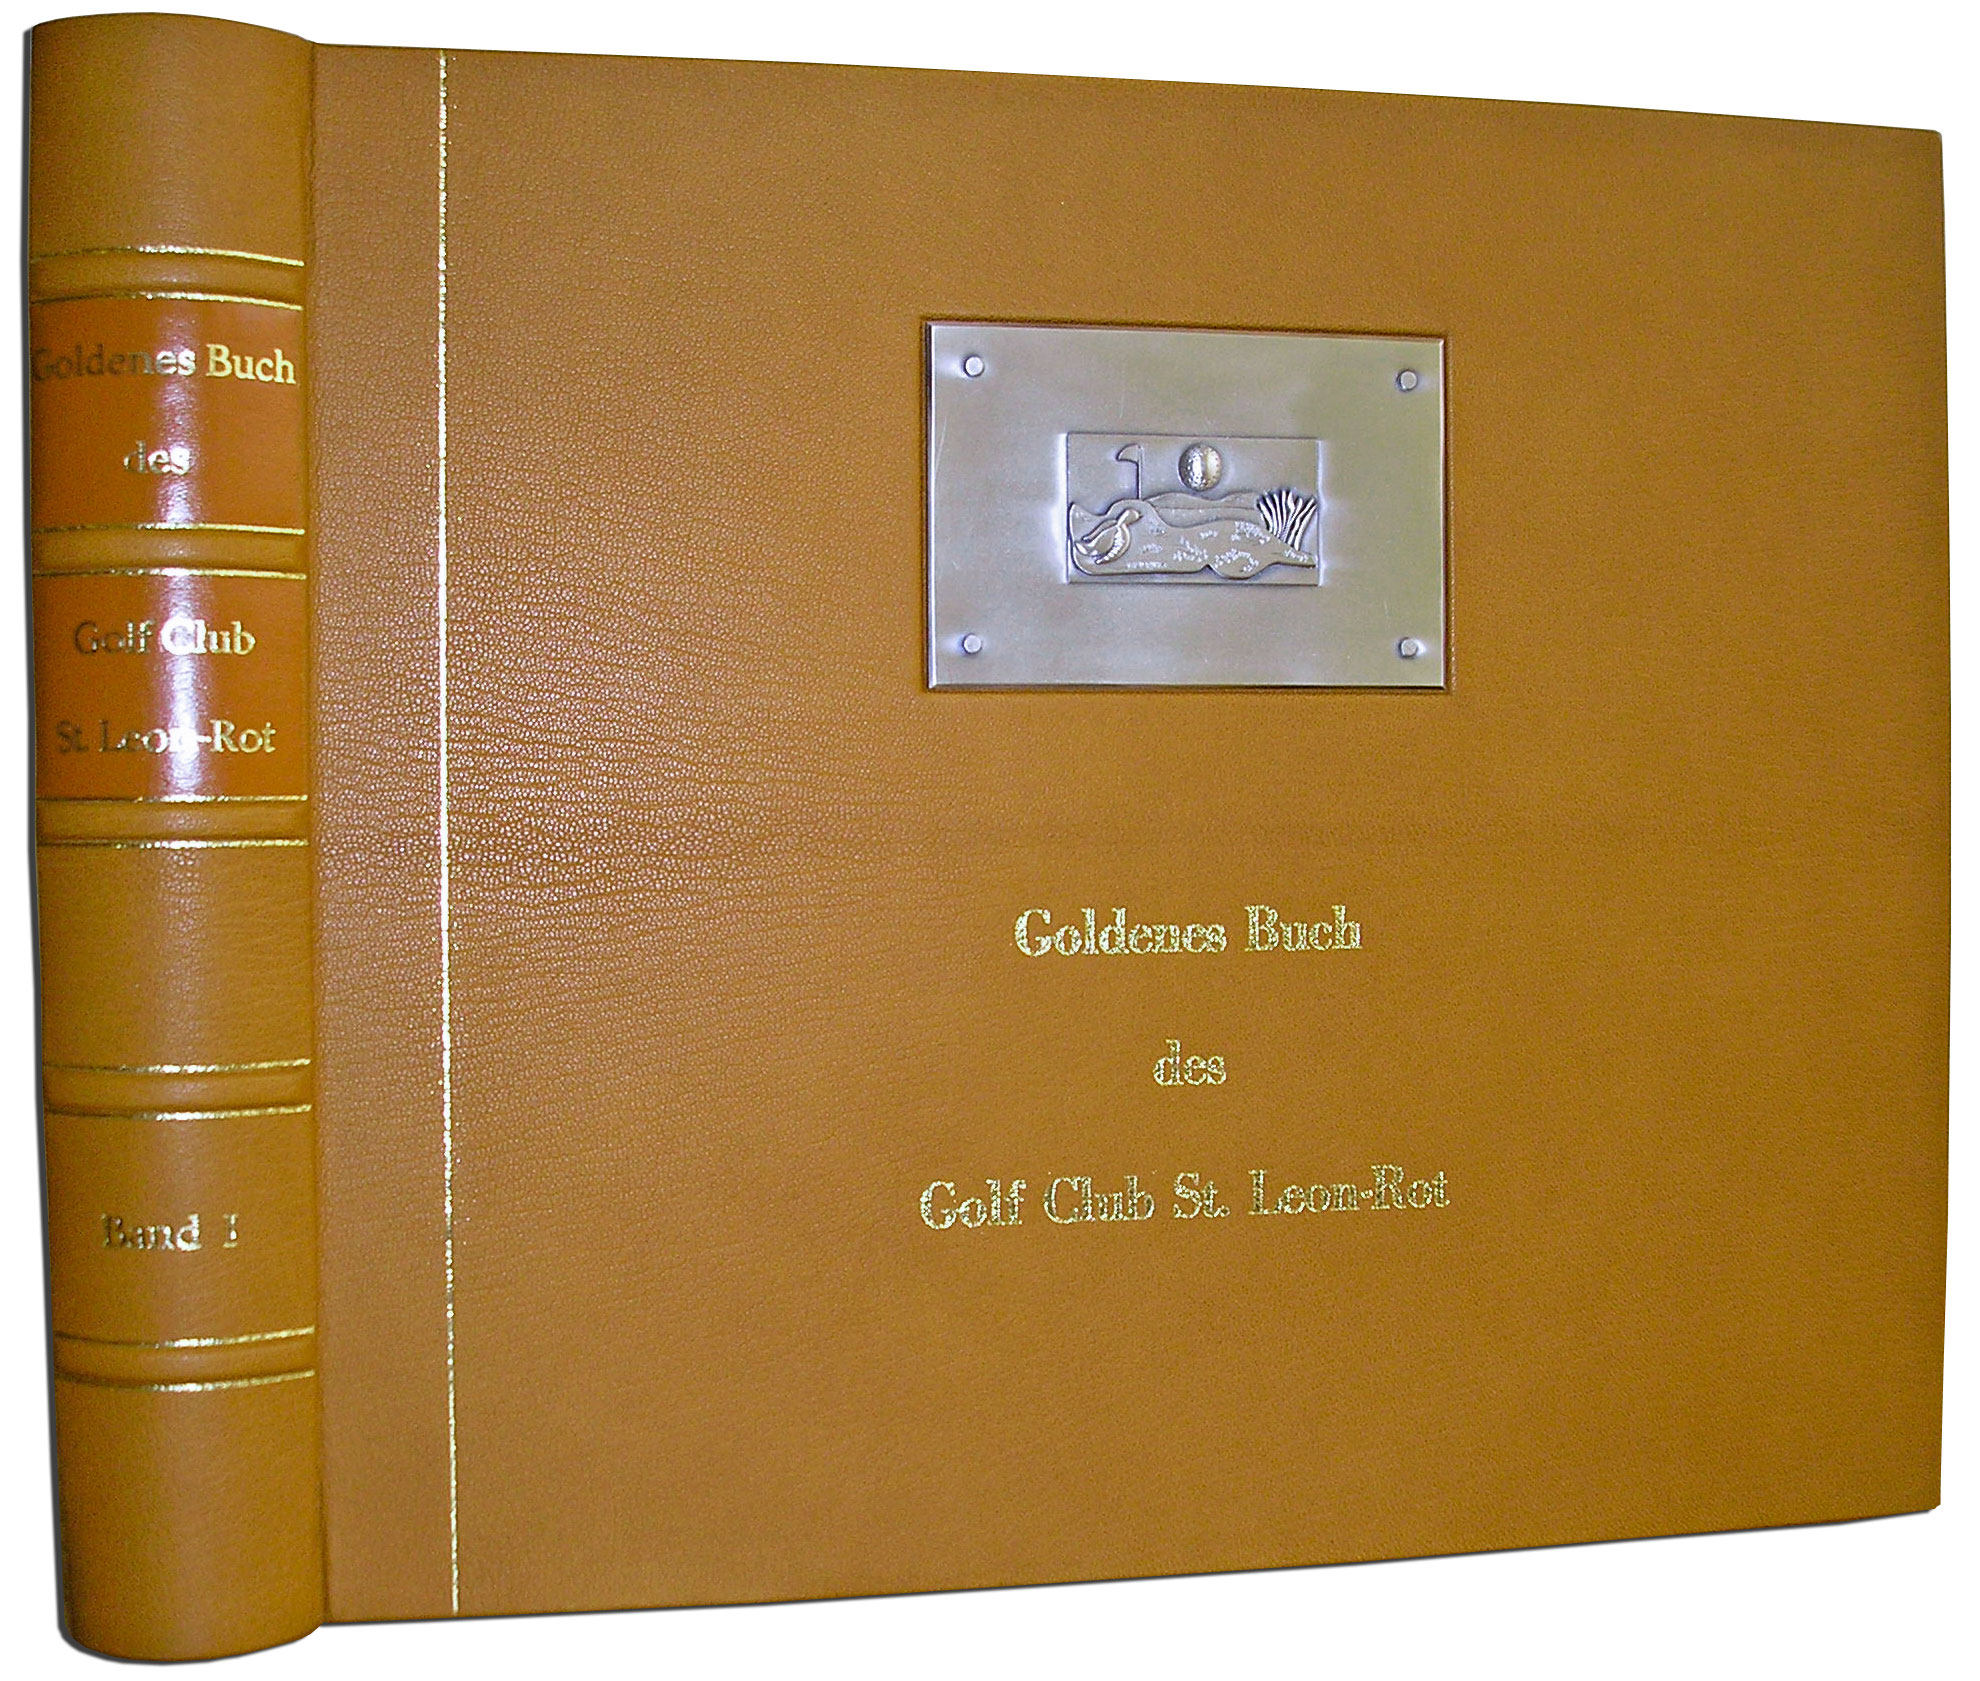 Goldenes Buch mit Medaillon